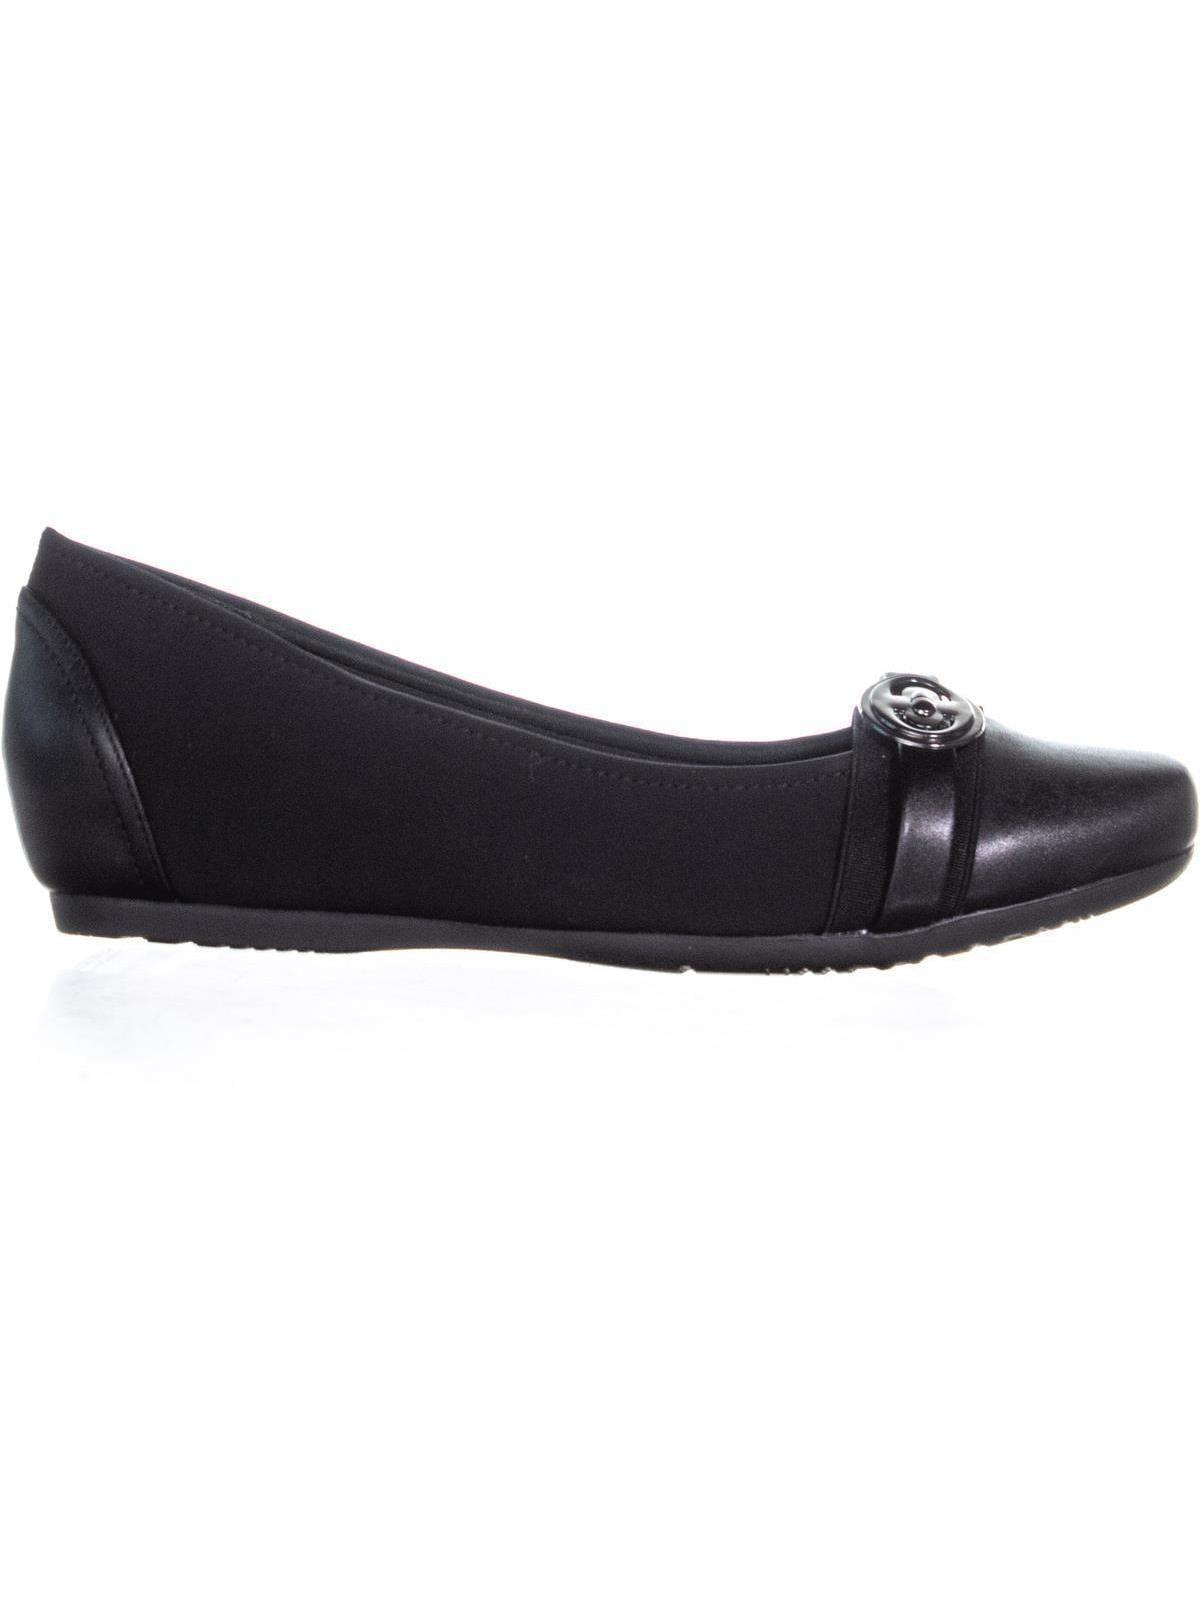 Womens BareTraps Black, Miana Slip On Ballet Close Toed Flats, Black, BareTraps 11 W US 428c36